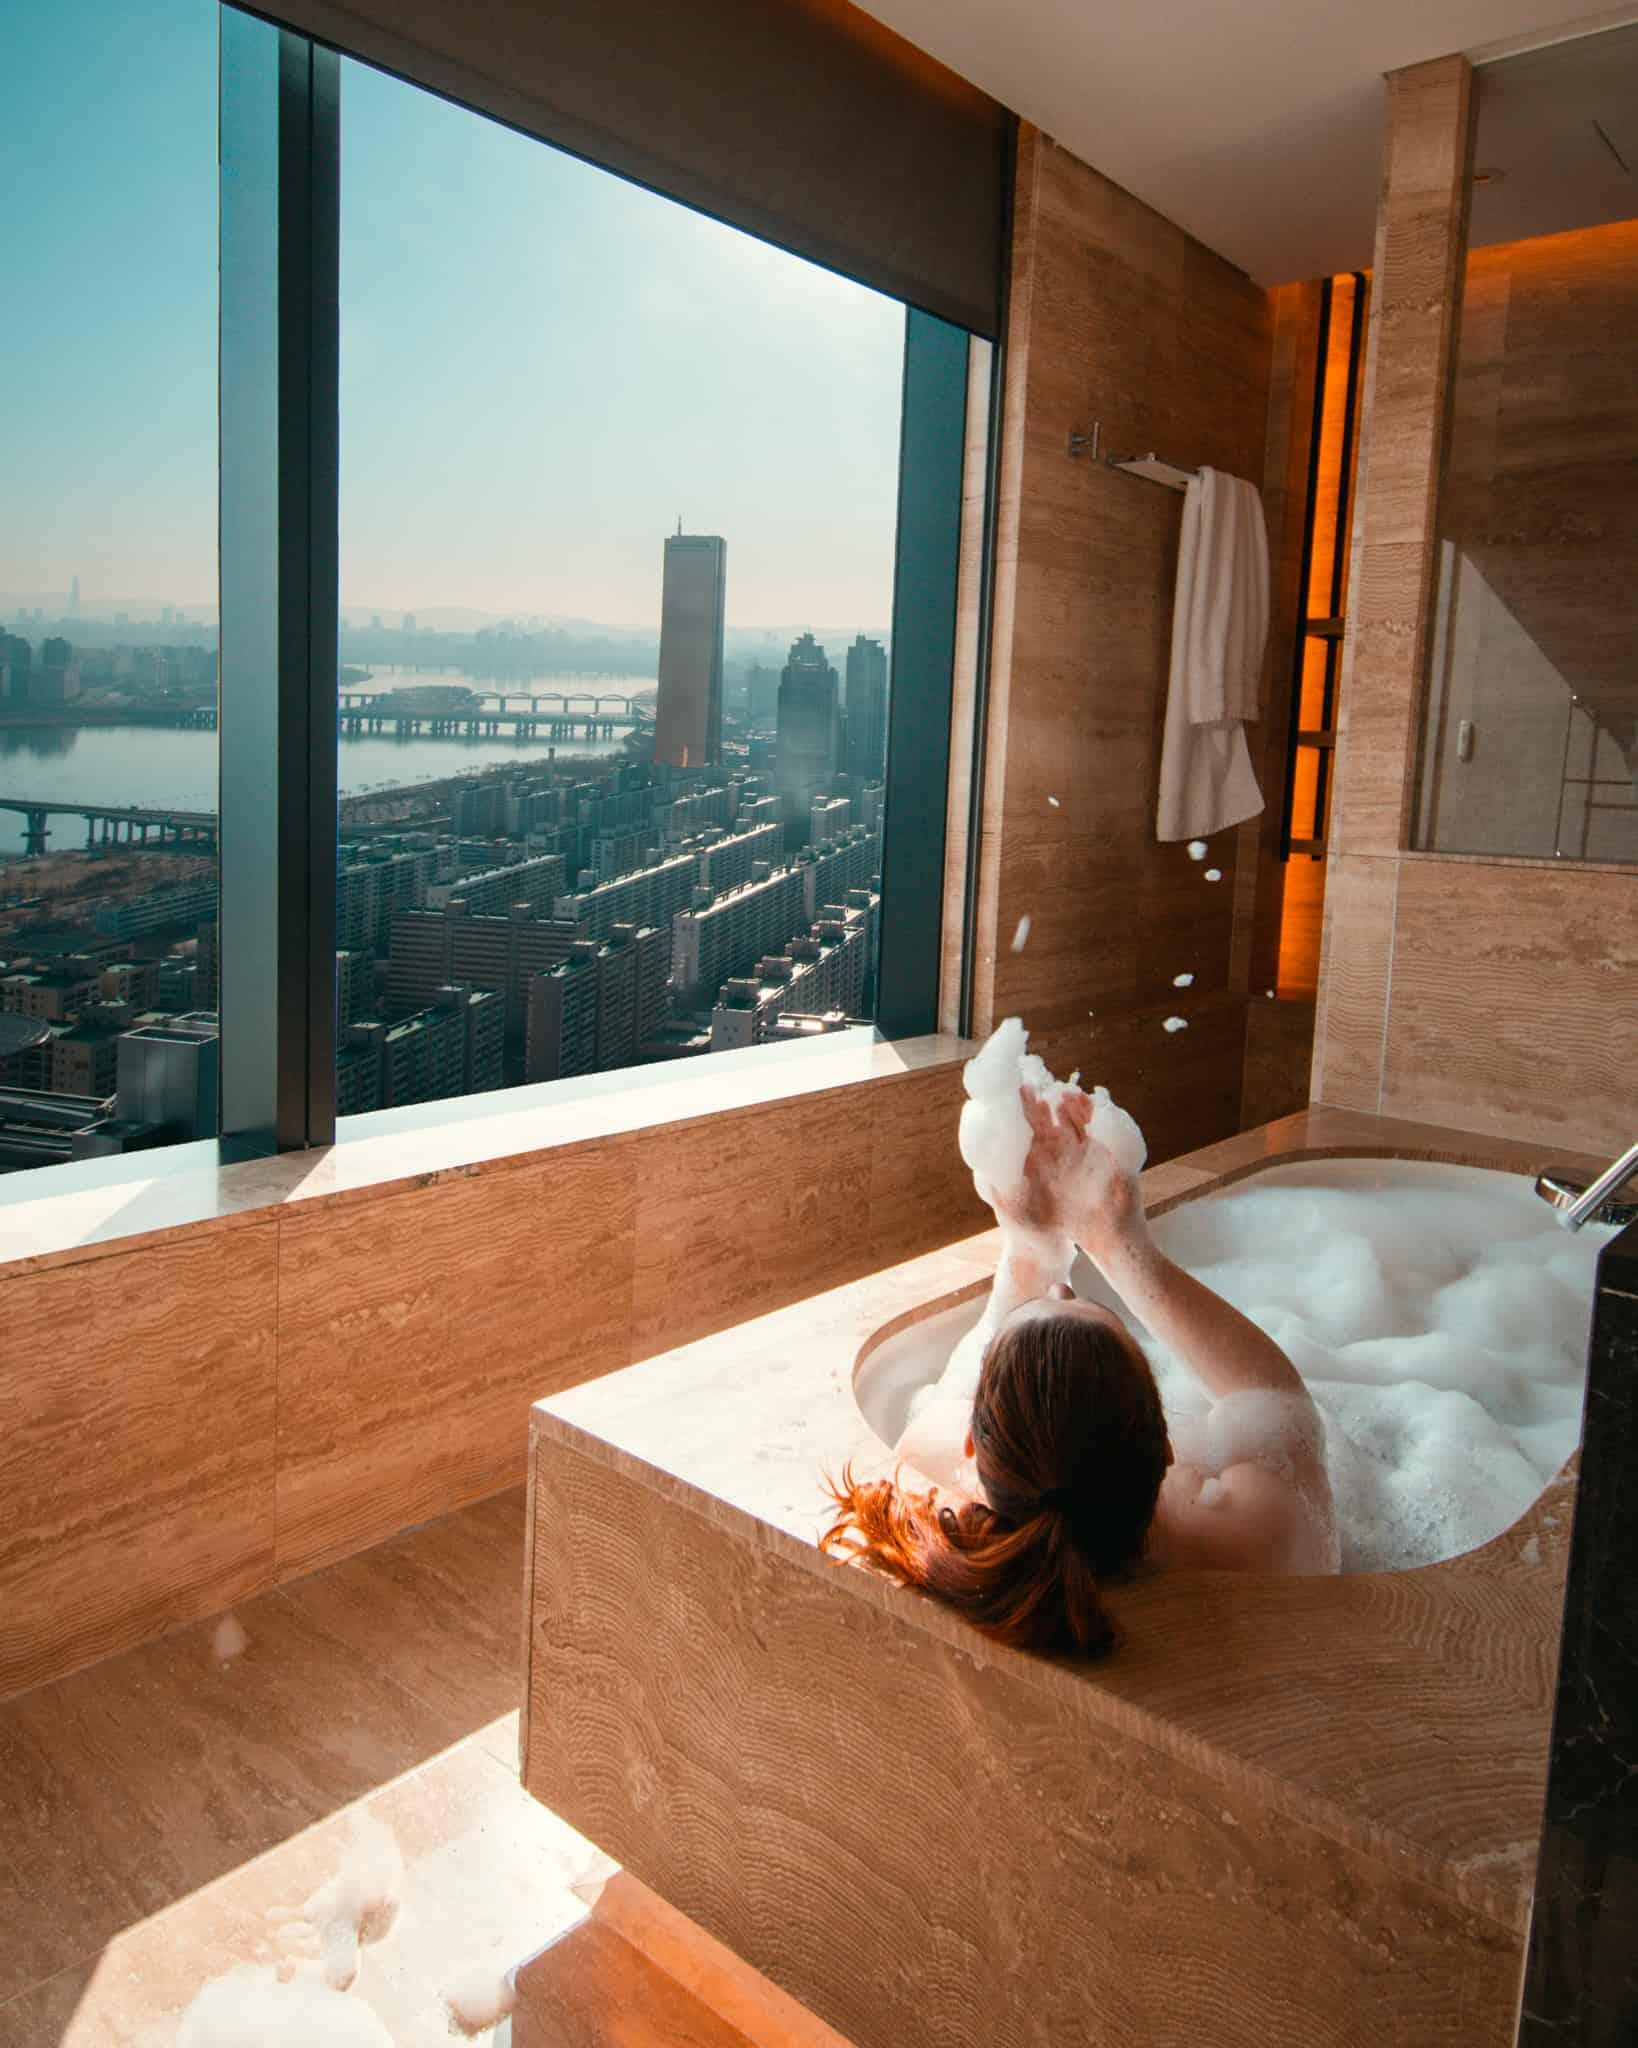 bathtub with view of Seoul